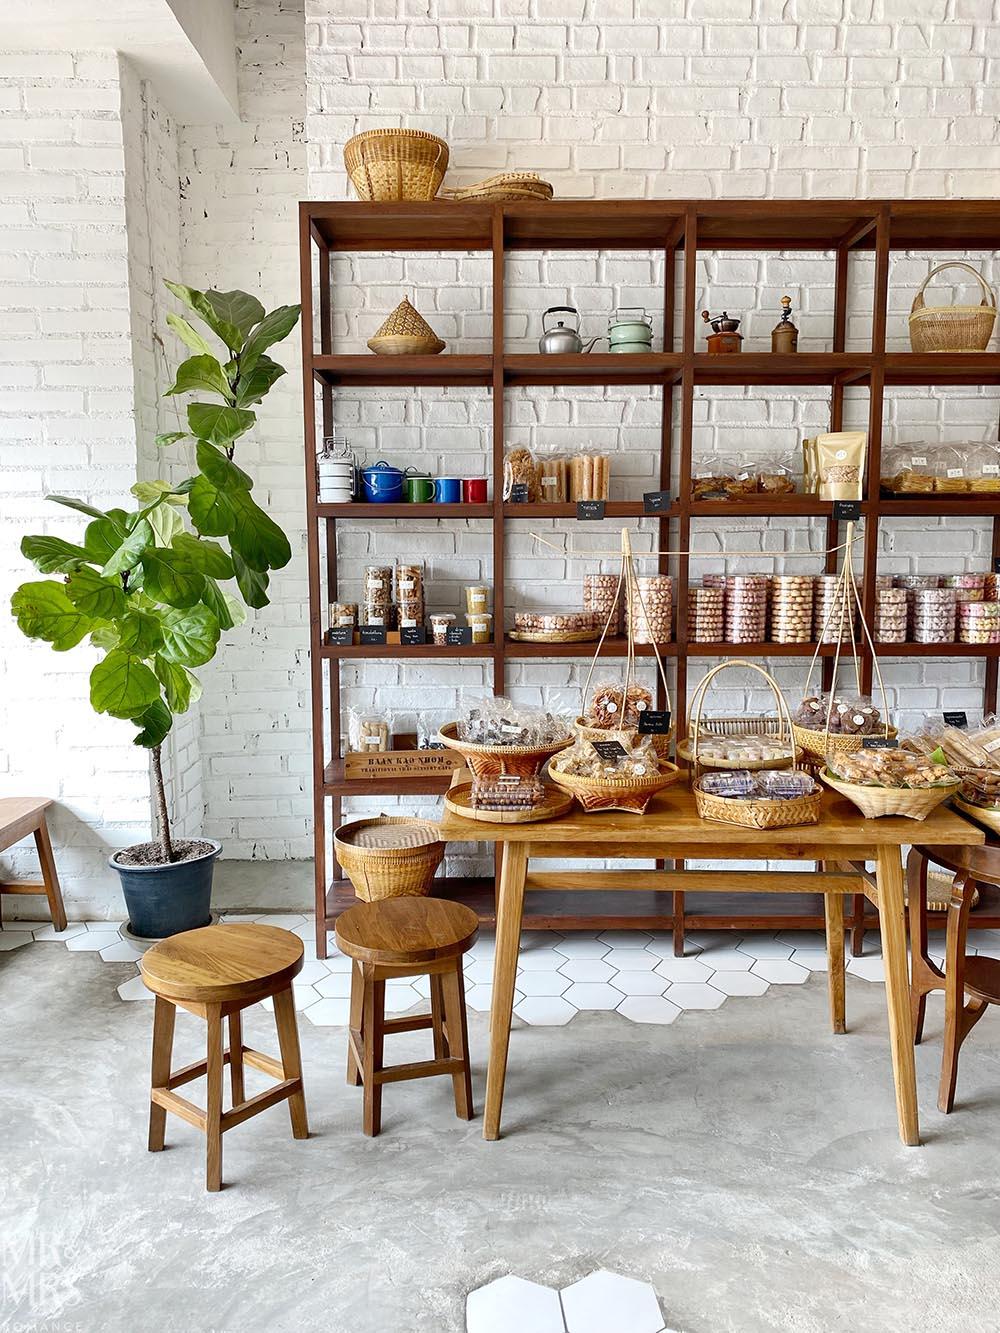 Baan Kao Nhom cafe